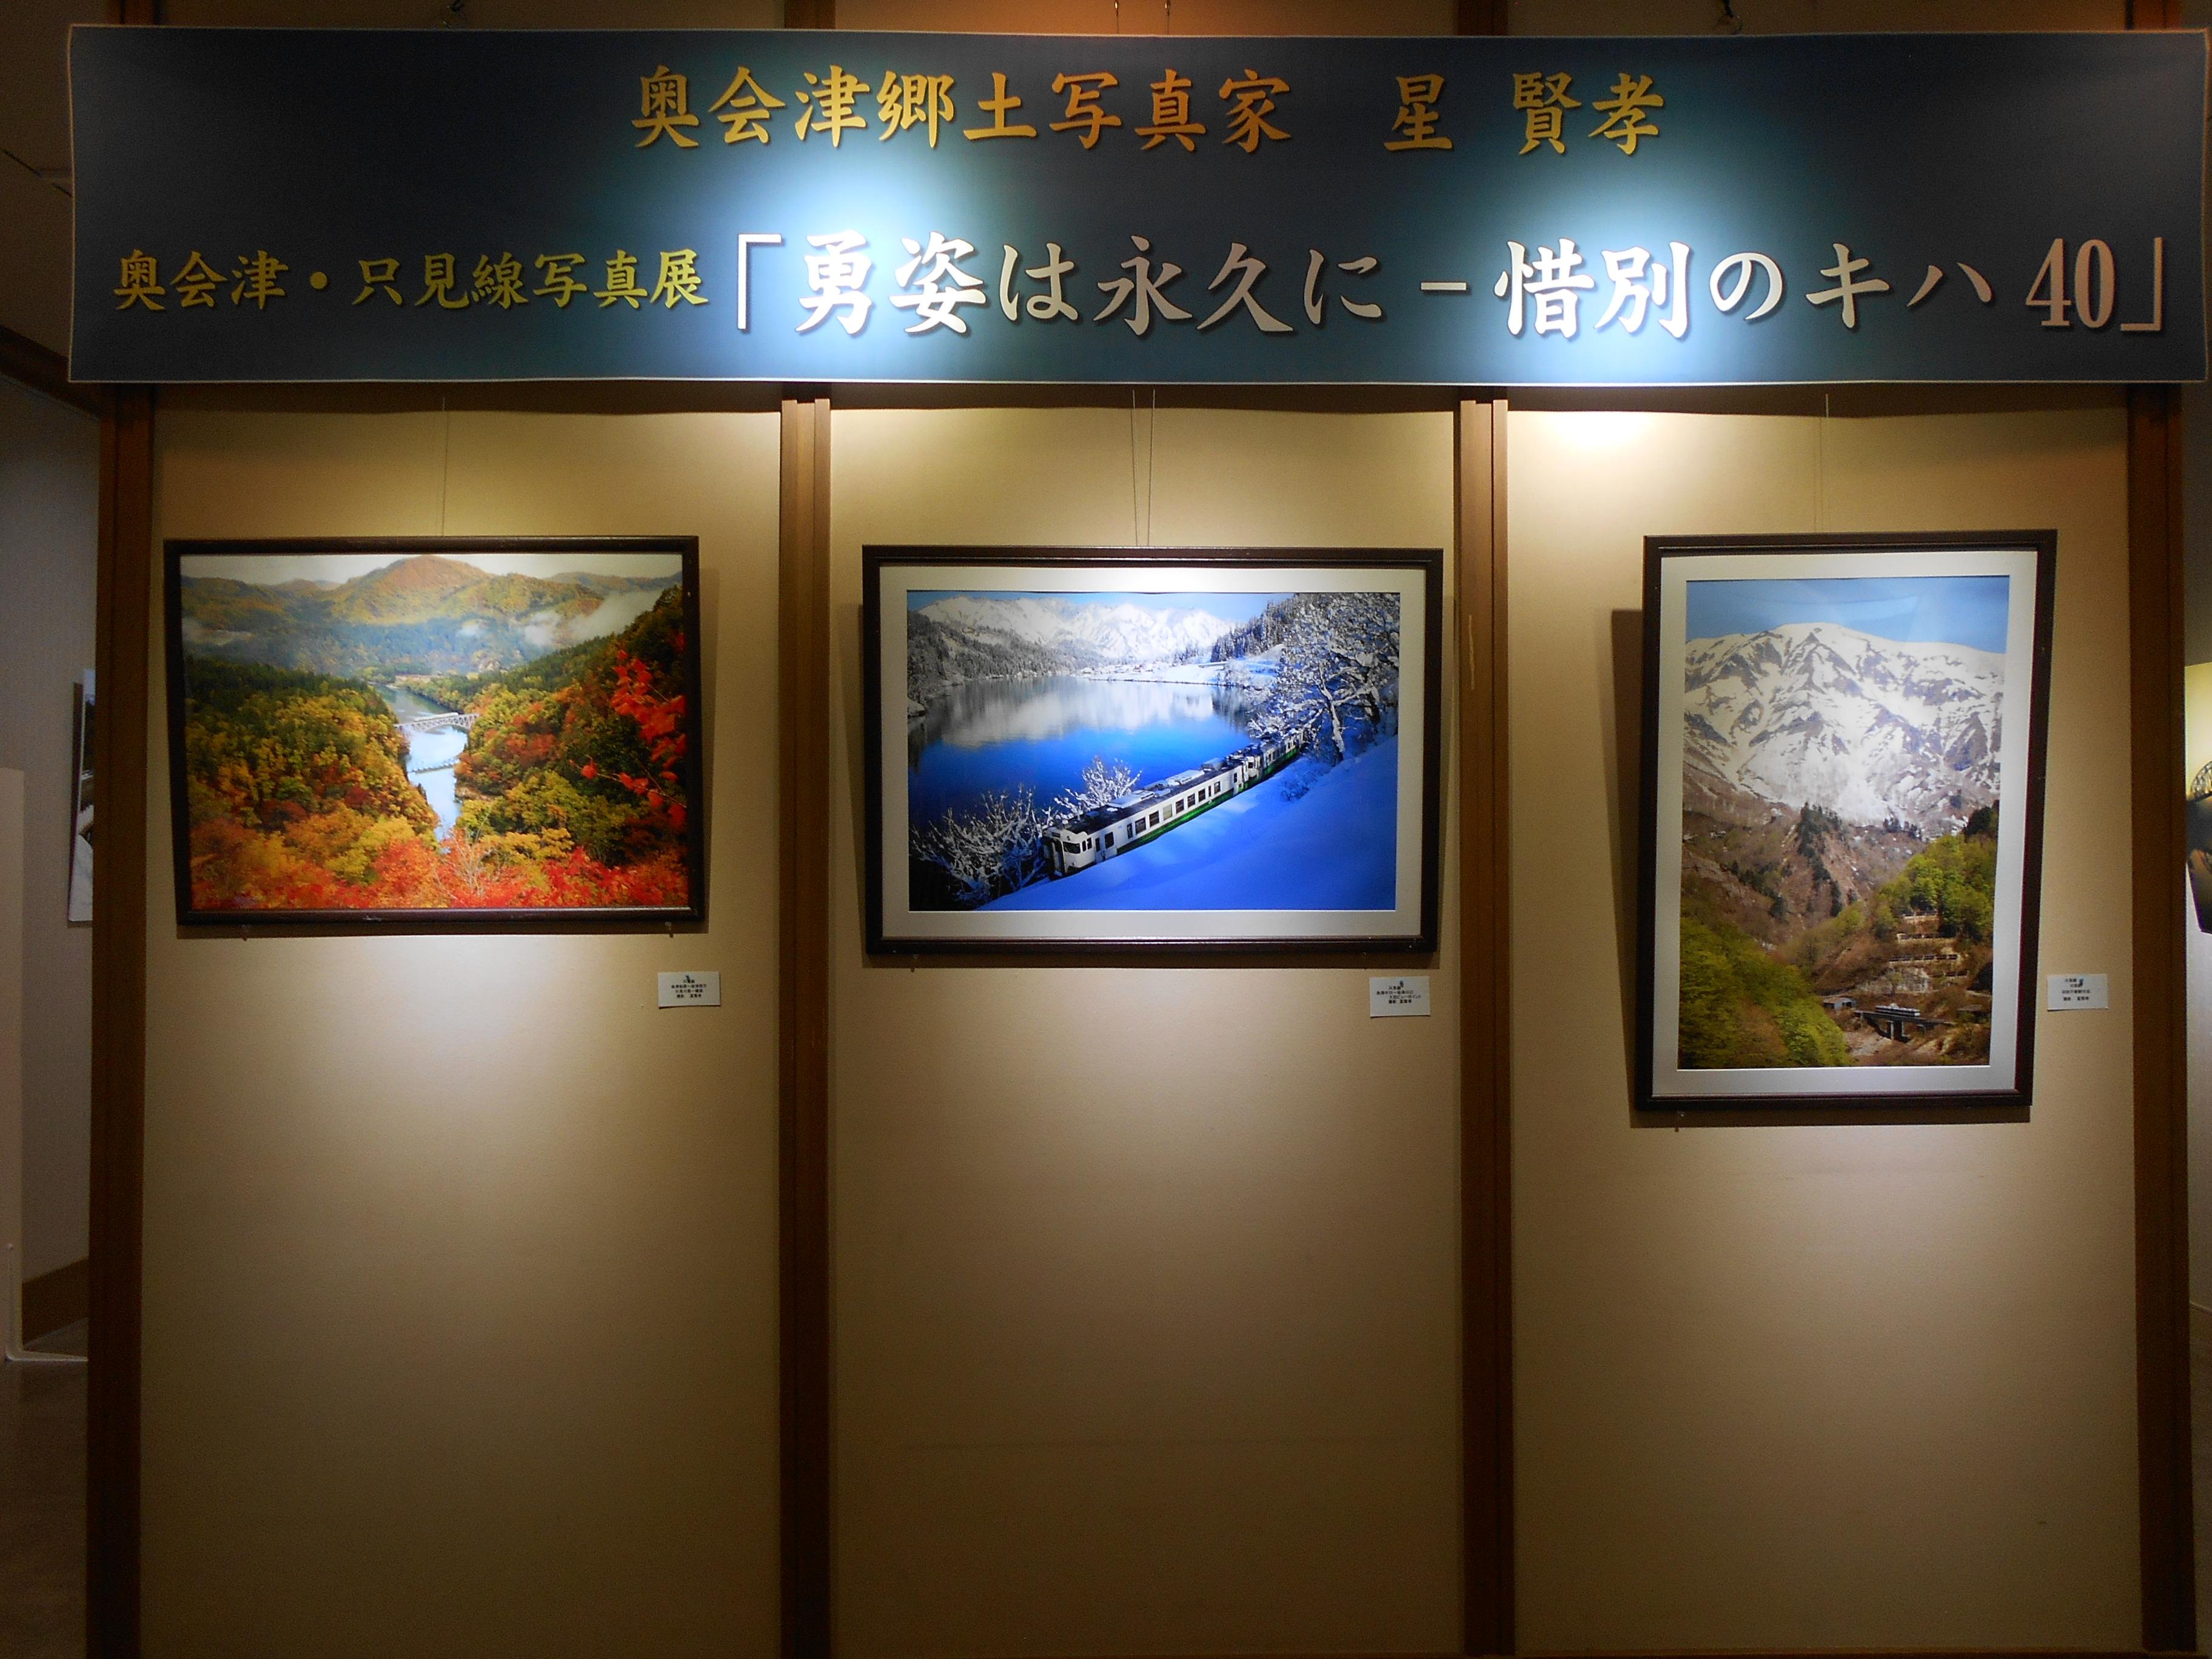 http://www.listel-inawashiro.jp/blog/2020/01/18/DSCN1340.JPG